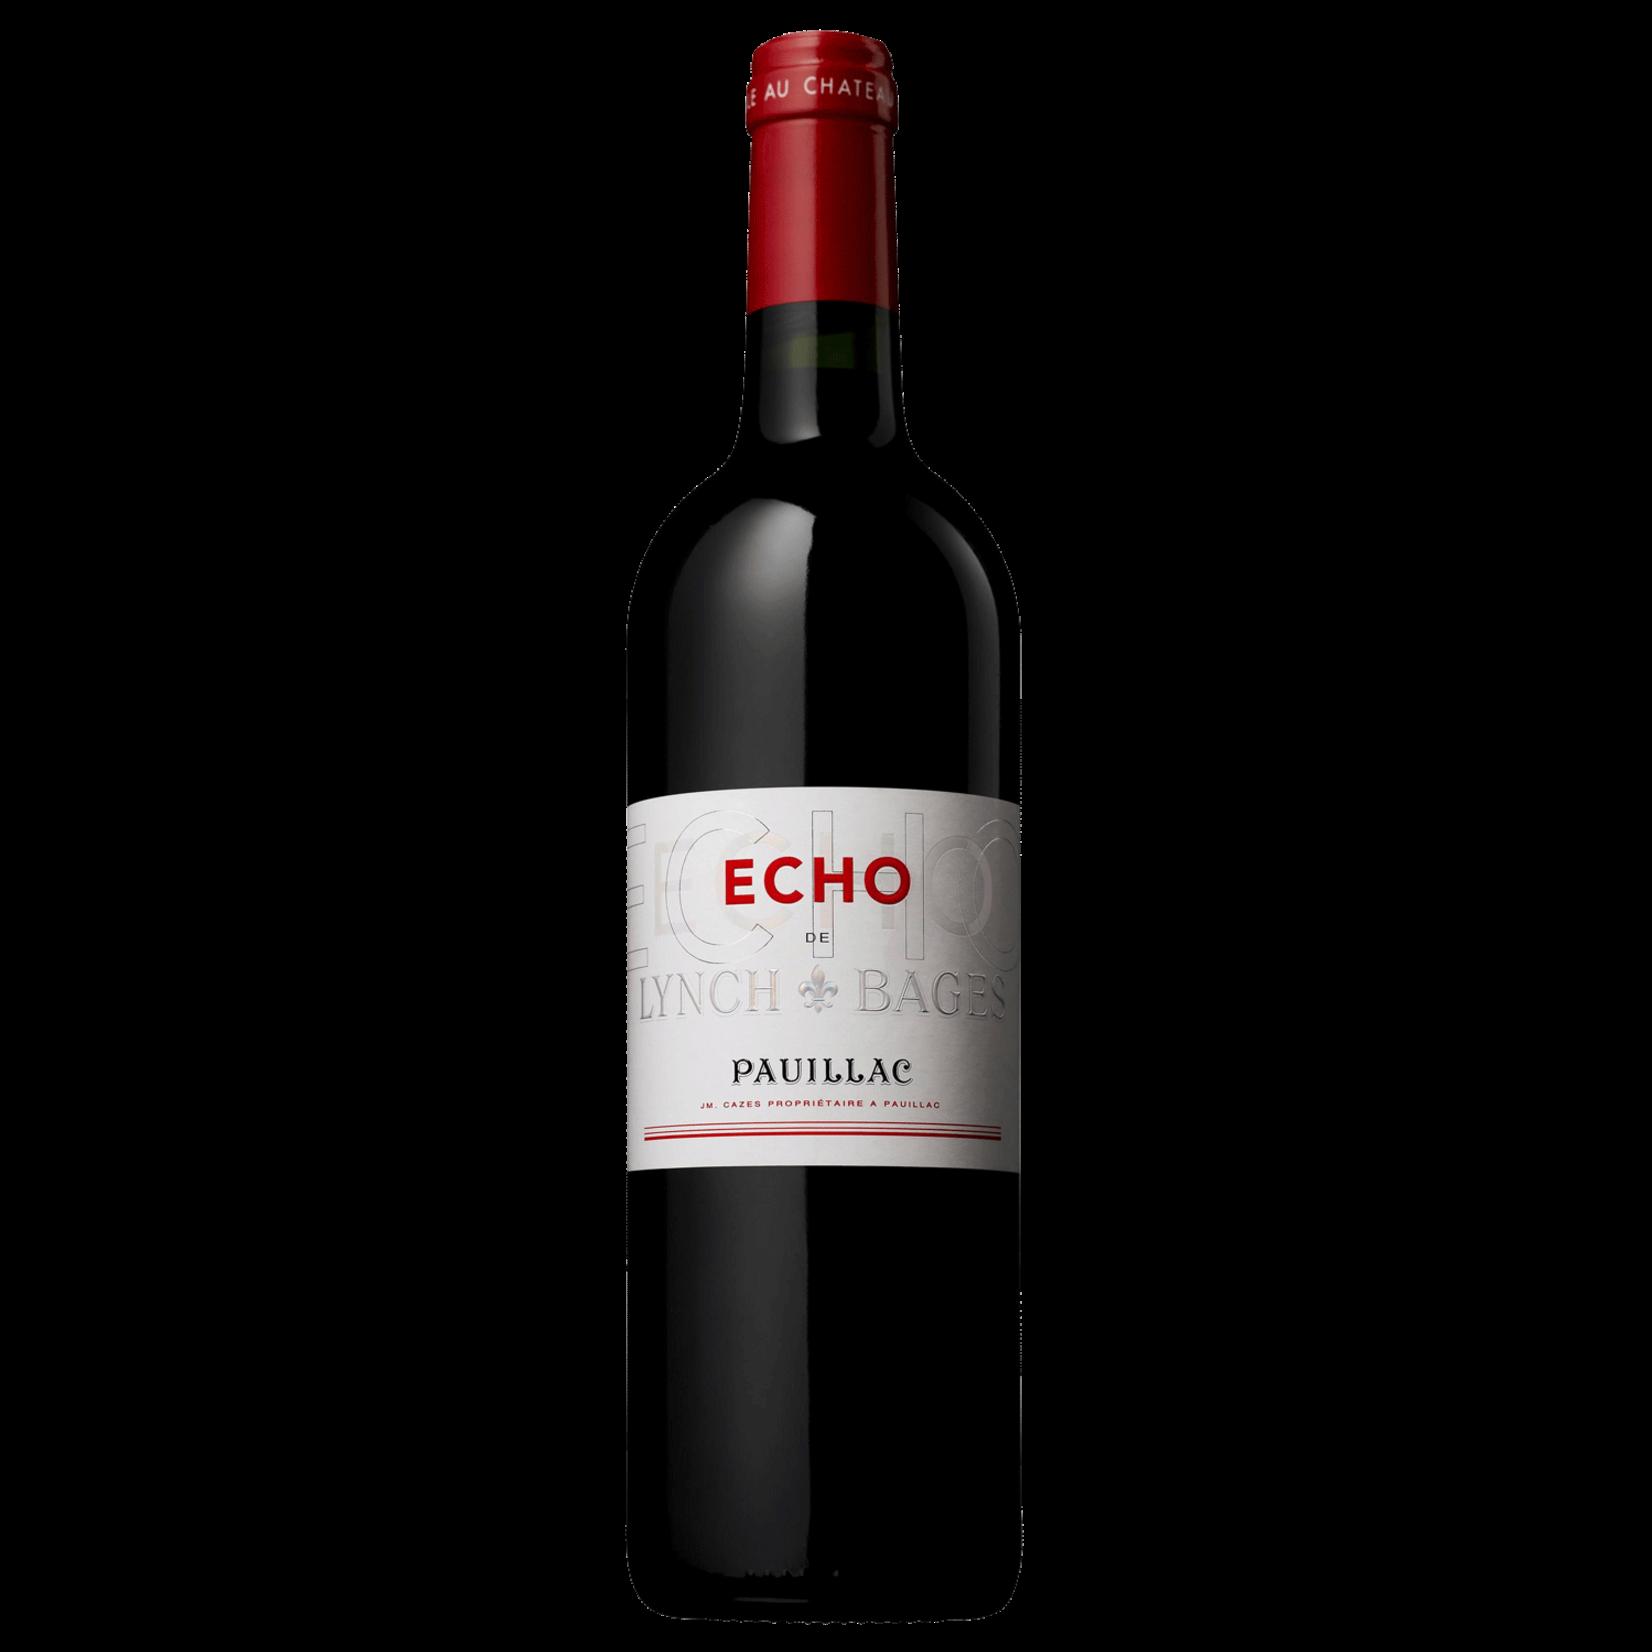 Wine Echo de Lynch Bages 2012